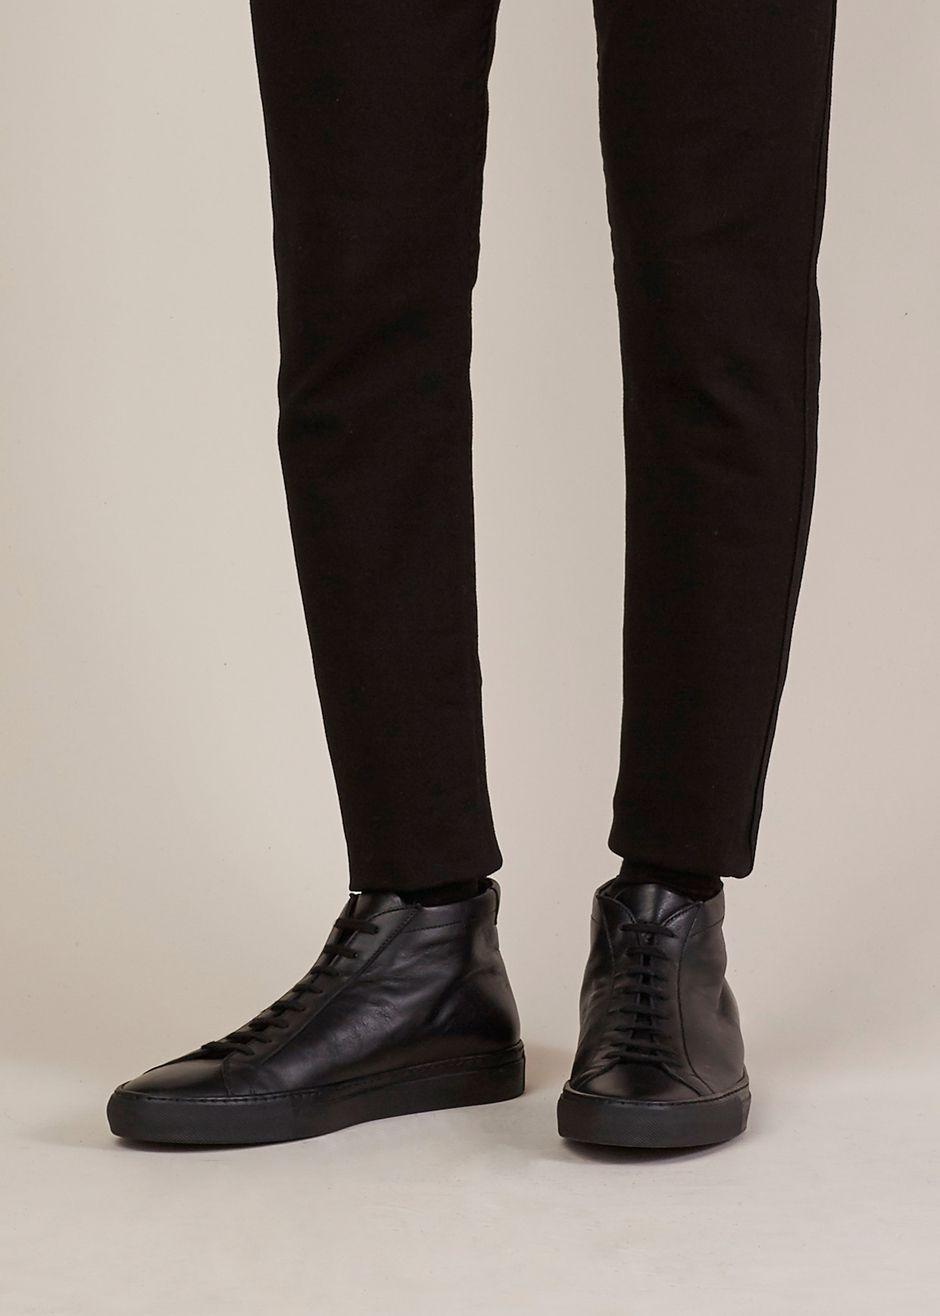 Common Projects Original Achilles Mid Sneaker Black Http Man